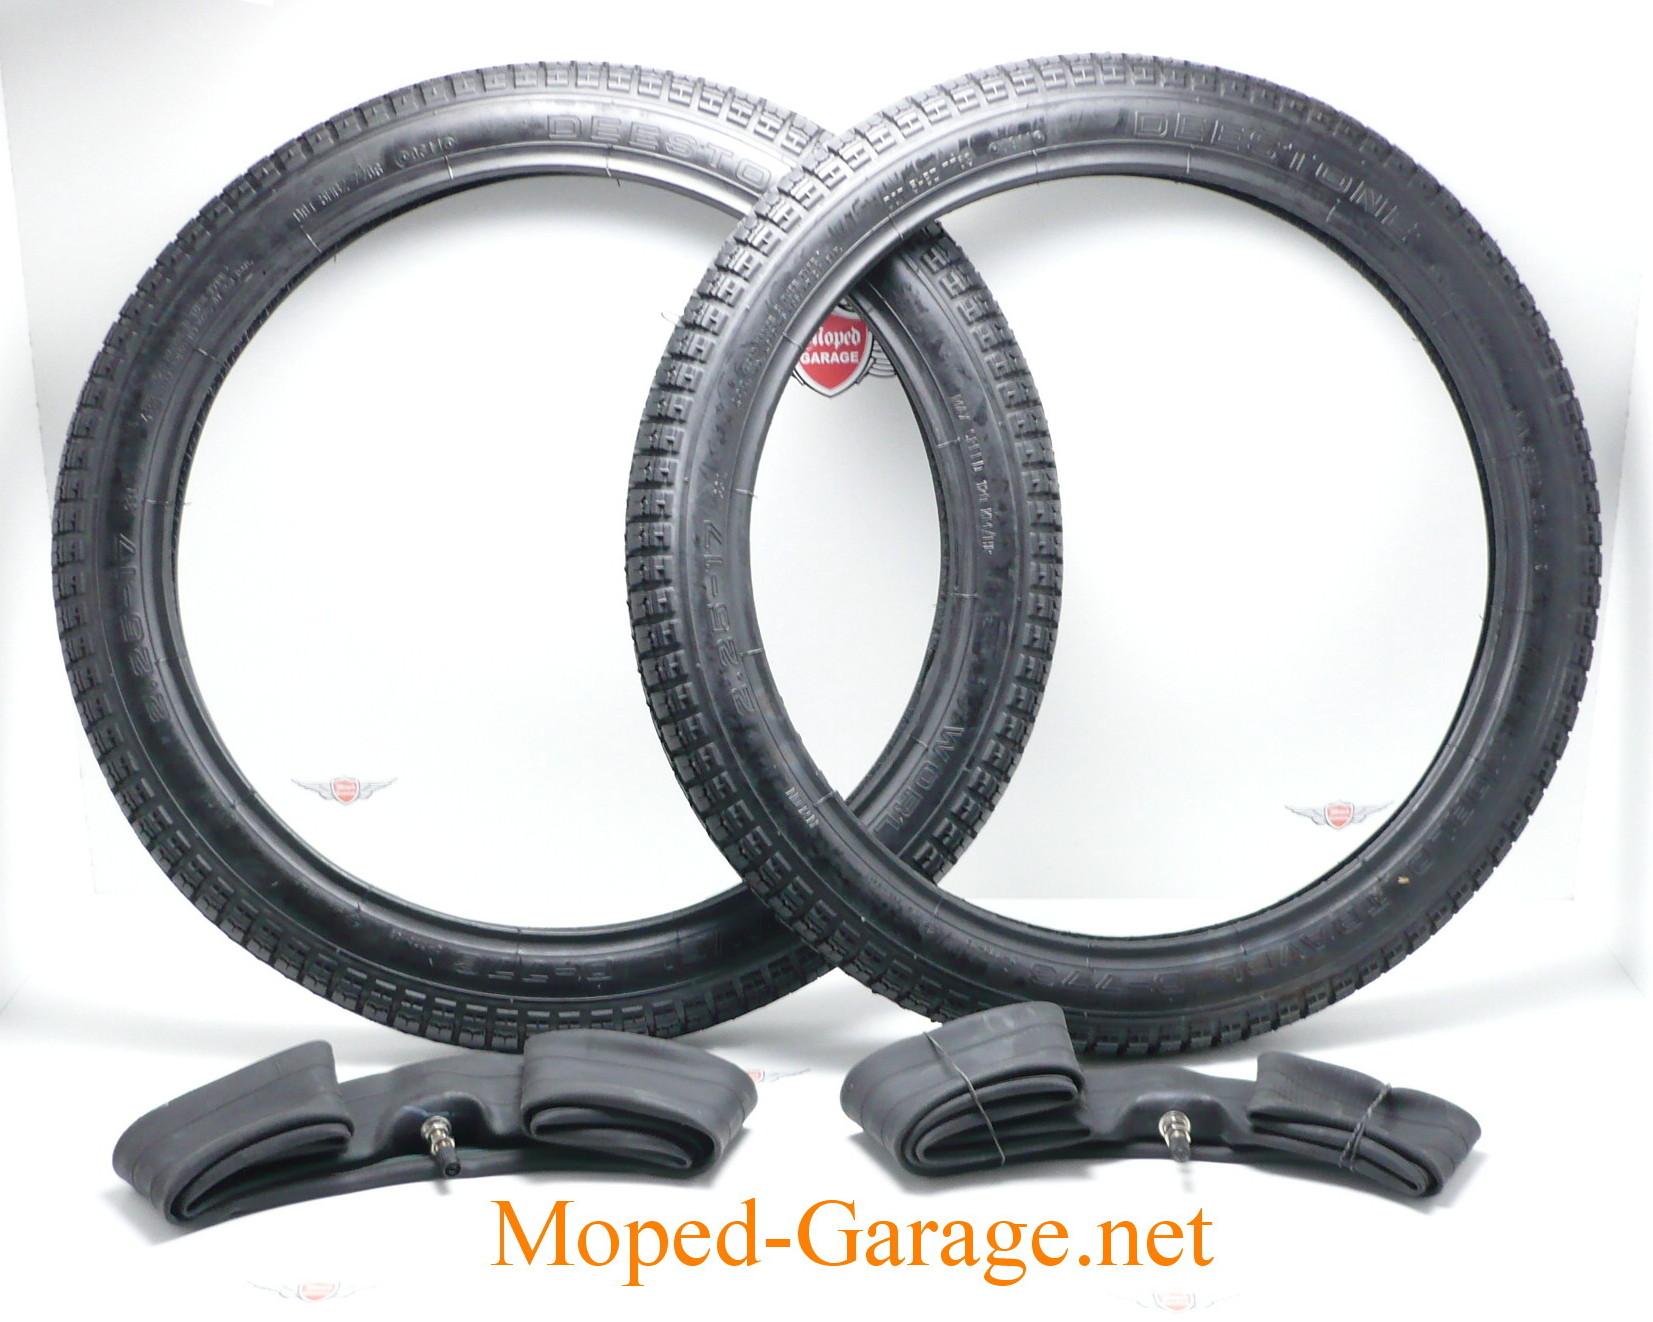 moped vee rubber mofa moped reifen schlauch satz 2 1 4 x 17 zoll moped teile kaufen. Black Bedroom Furniture Sets. Home Design Ideas